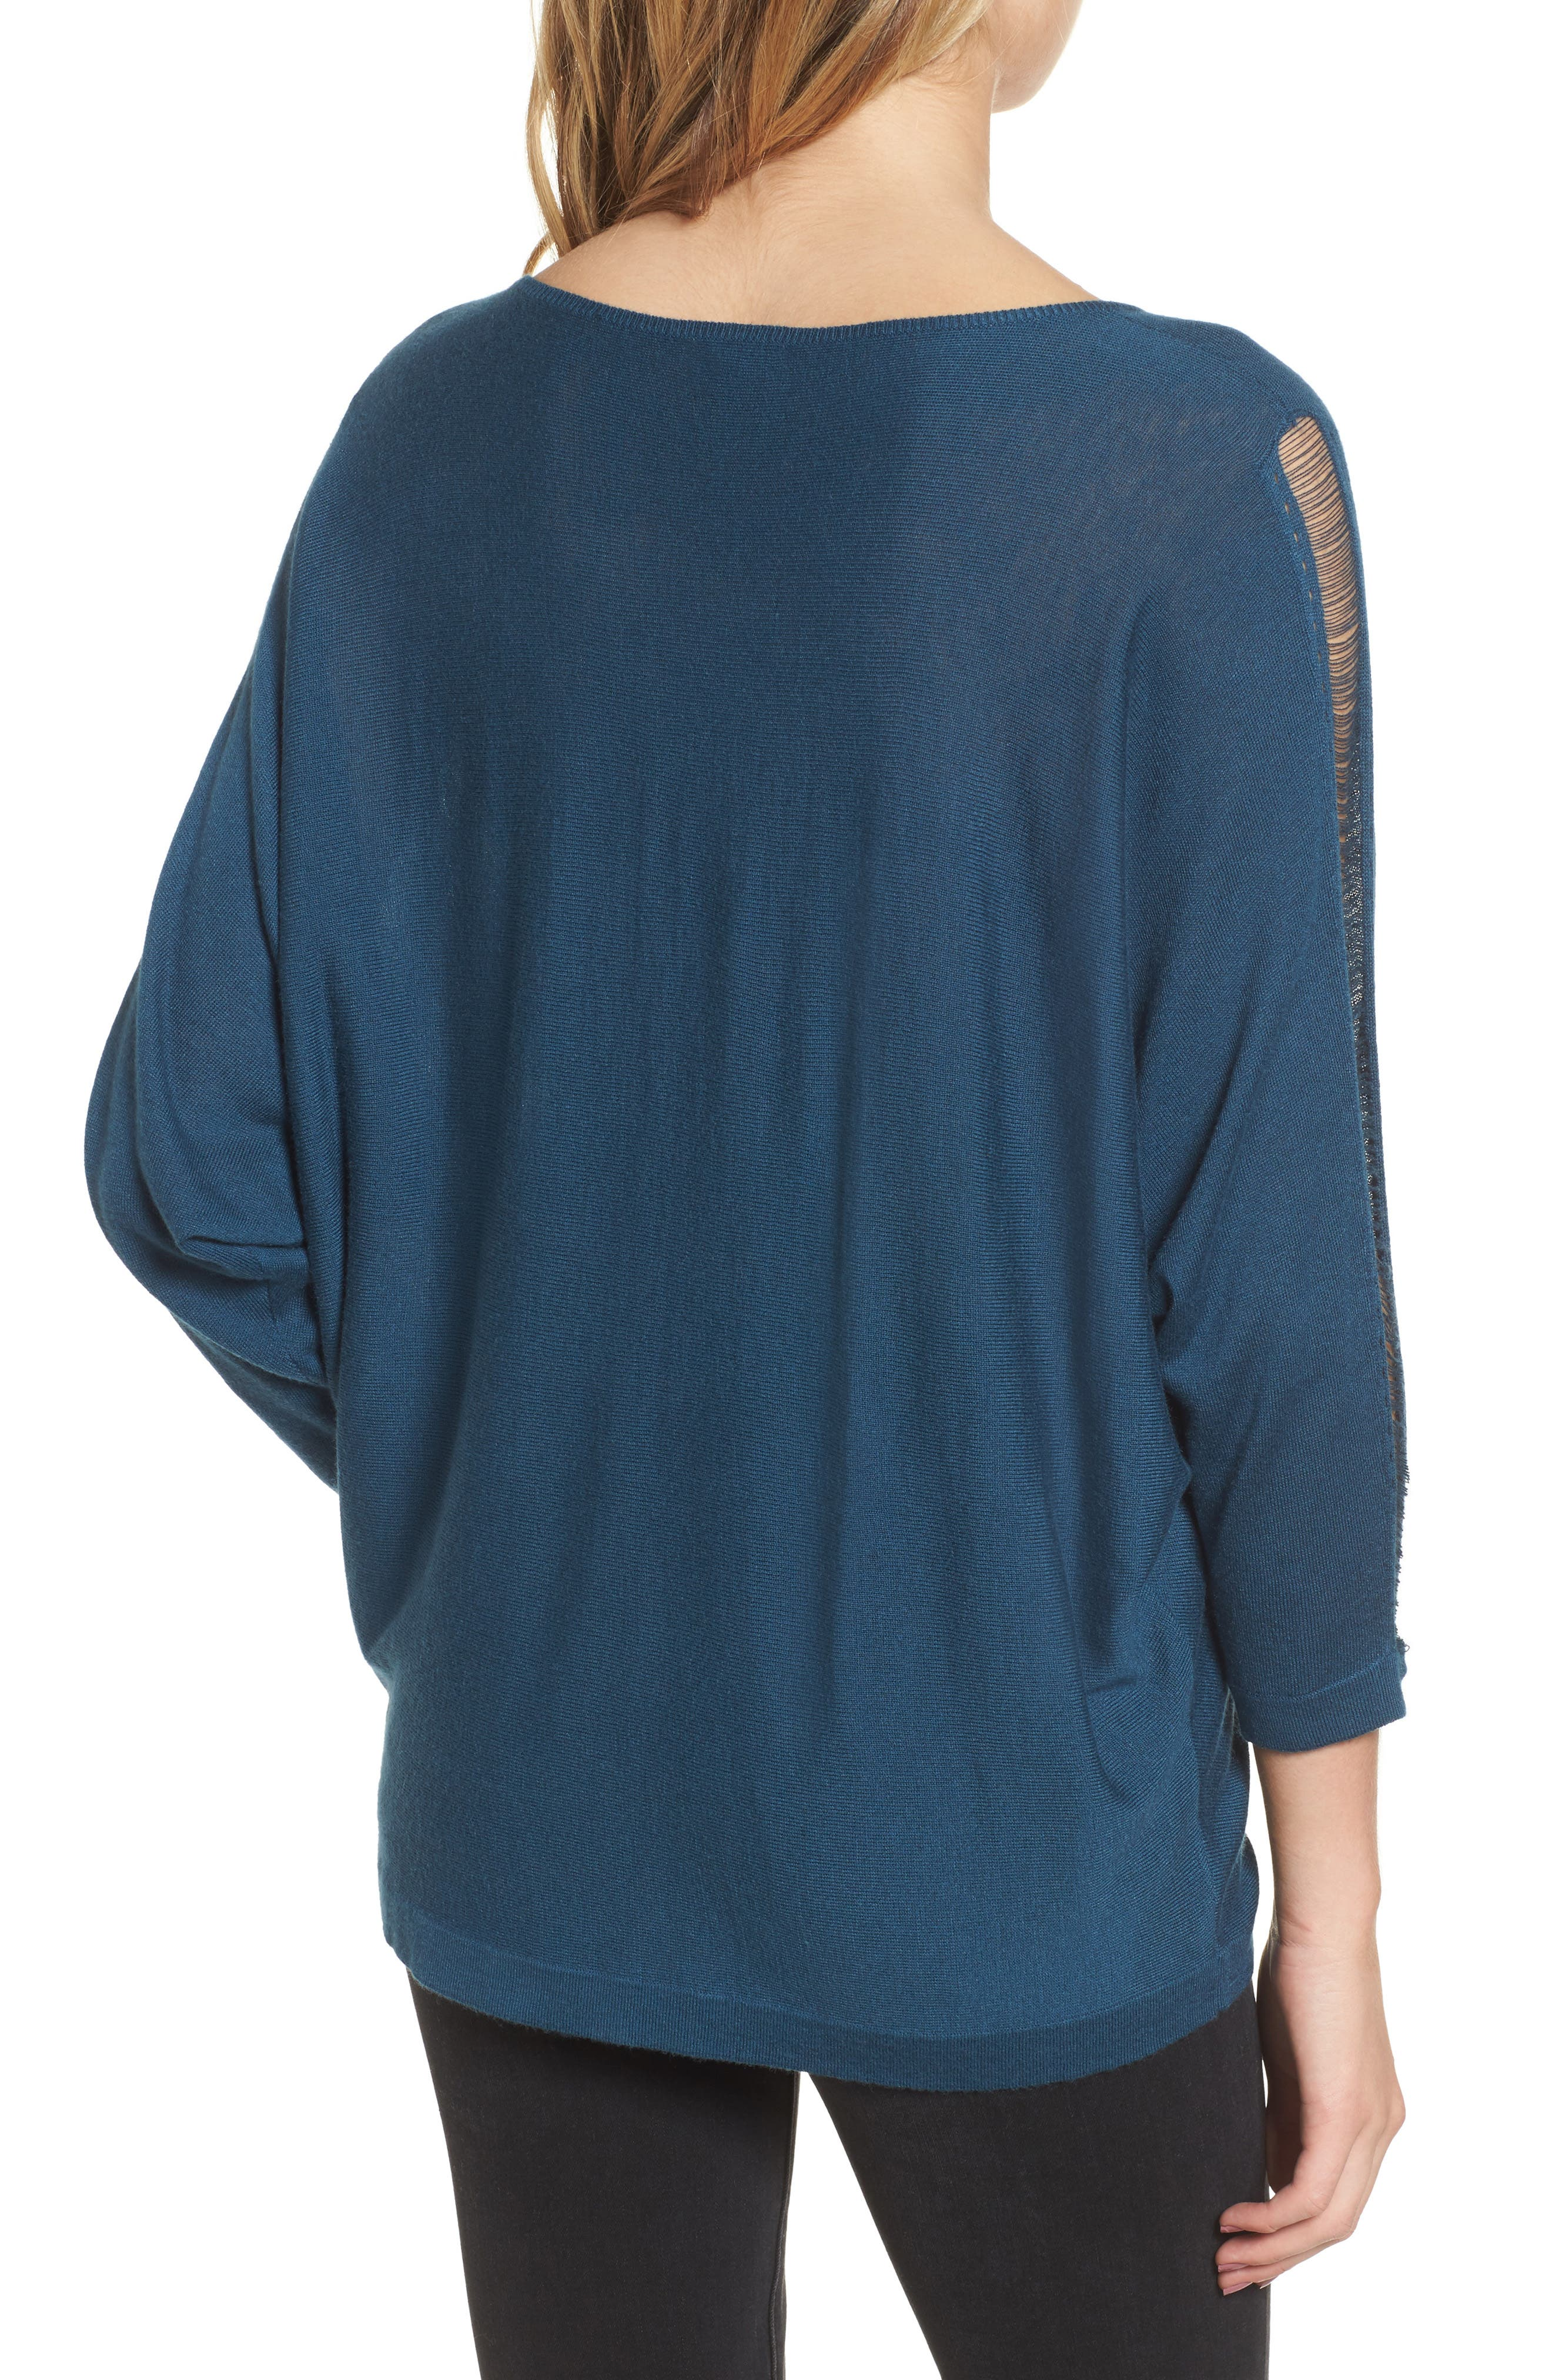 Whitlock Sweater,                             Alternate thumbnail 4, color,